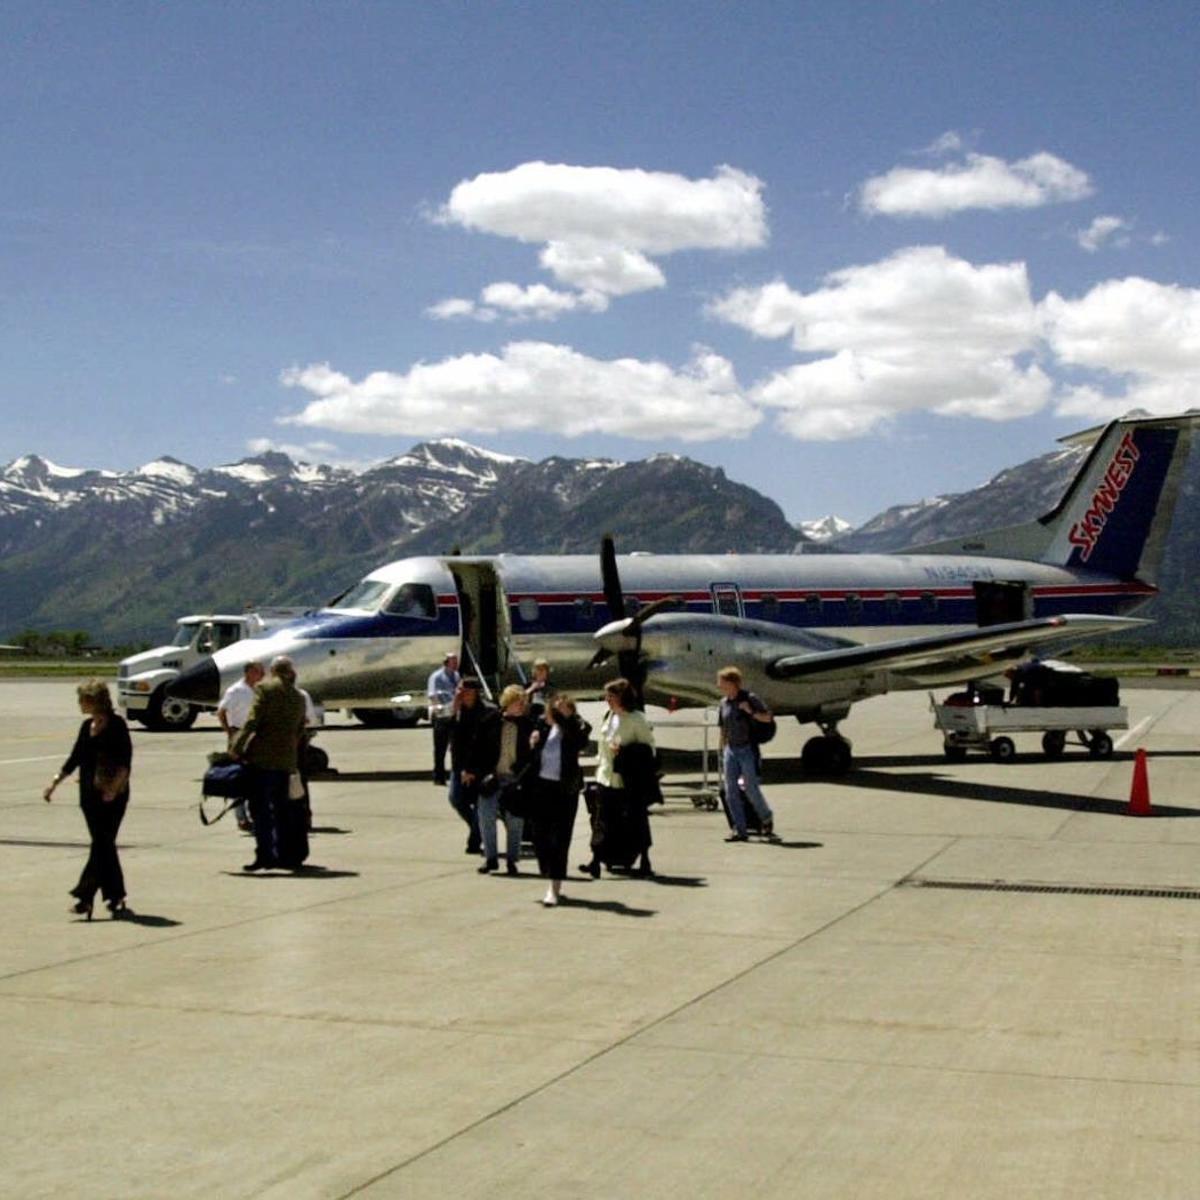 Jackson Hole Airport >> Jackson Hole Airport Board Must Follow Public Records Law